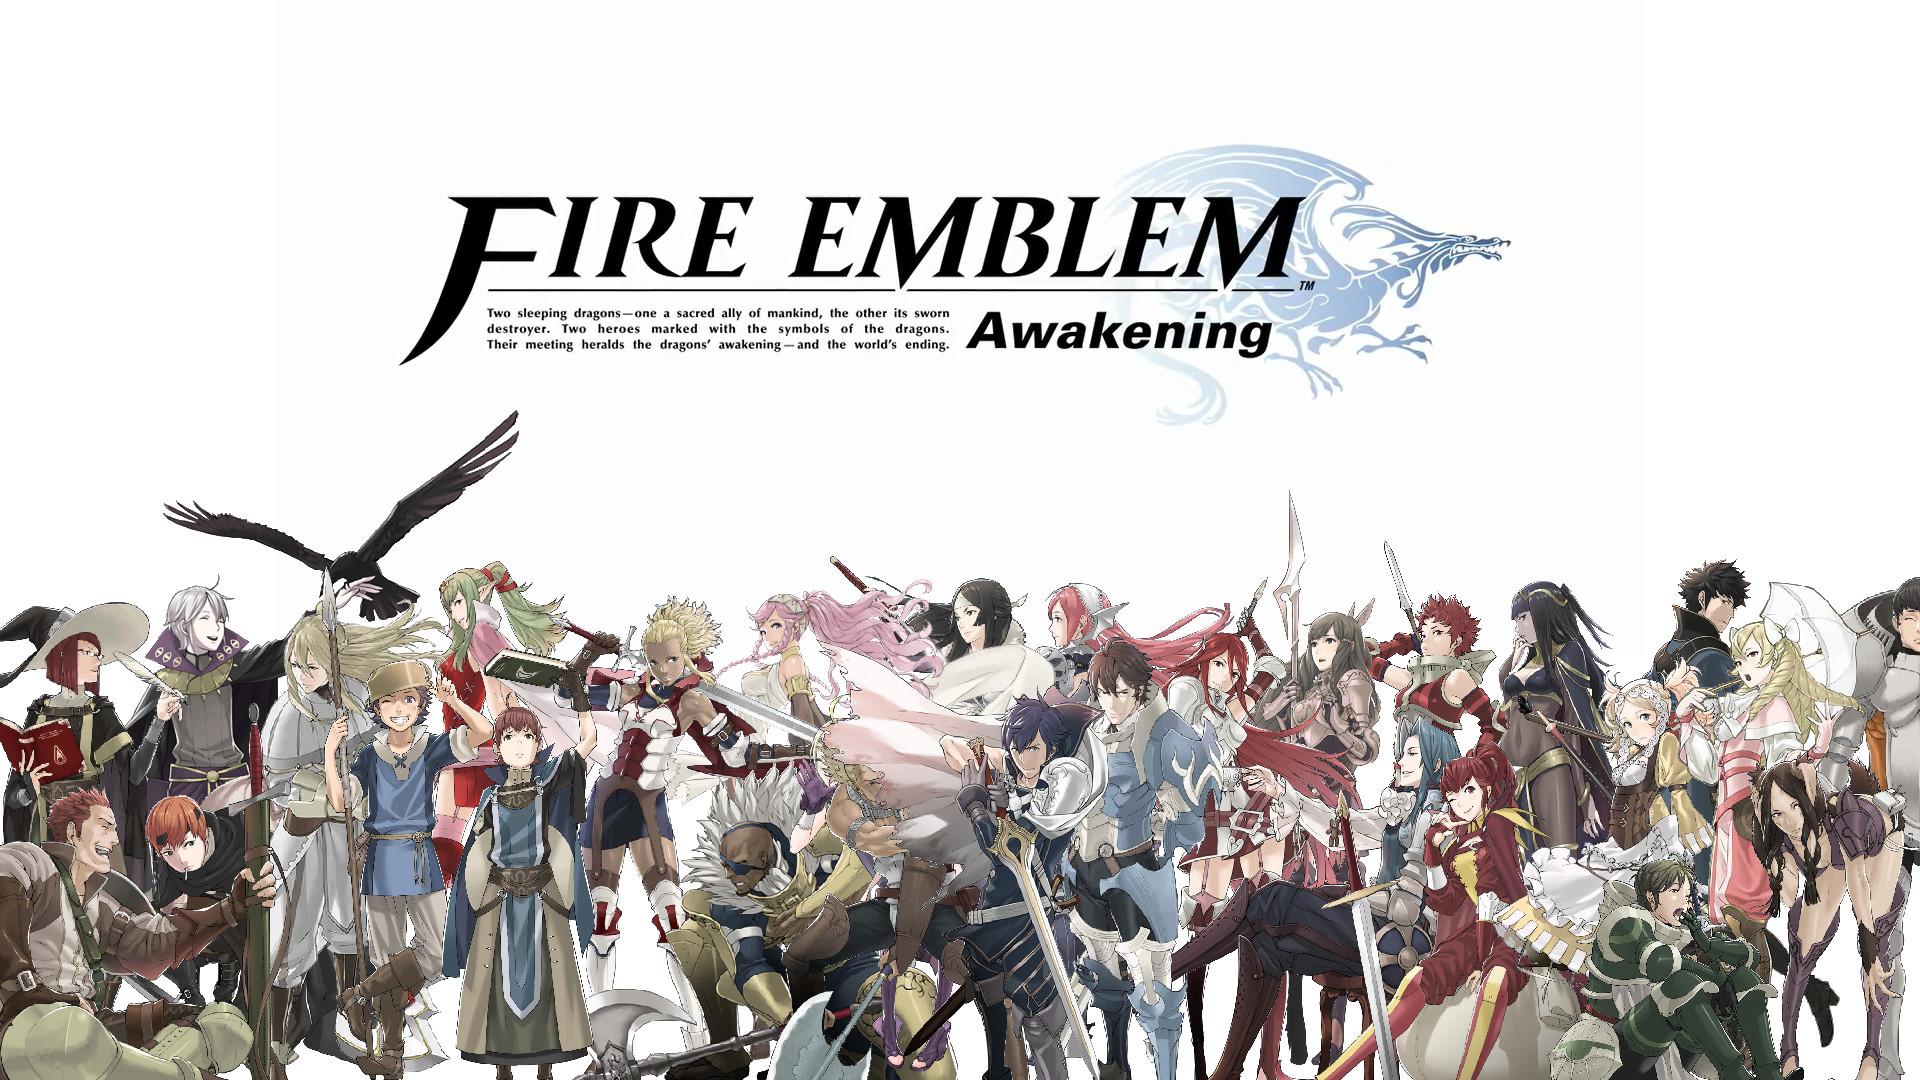 AwakeningFire Emblem Awakening Wallpaper (1920×1080) [OC] …